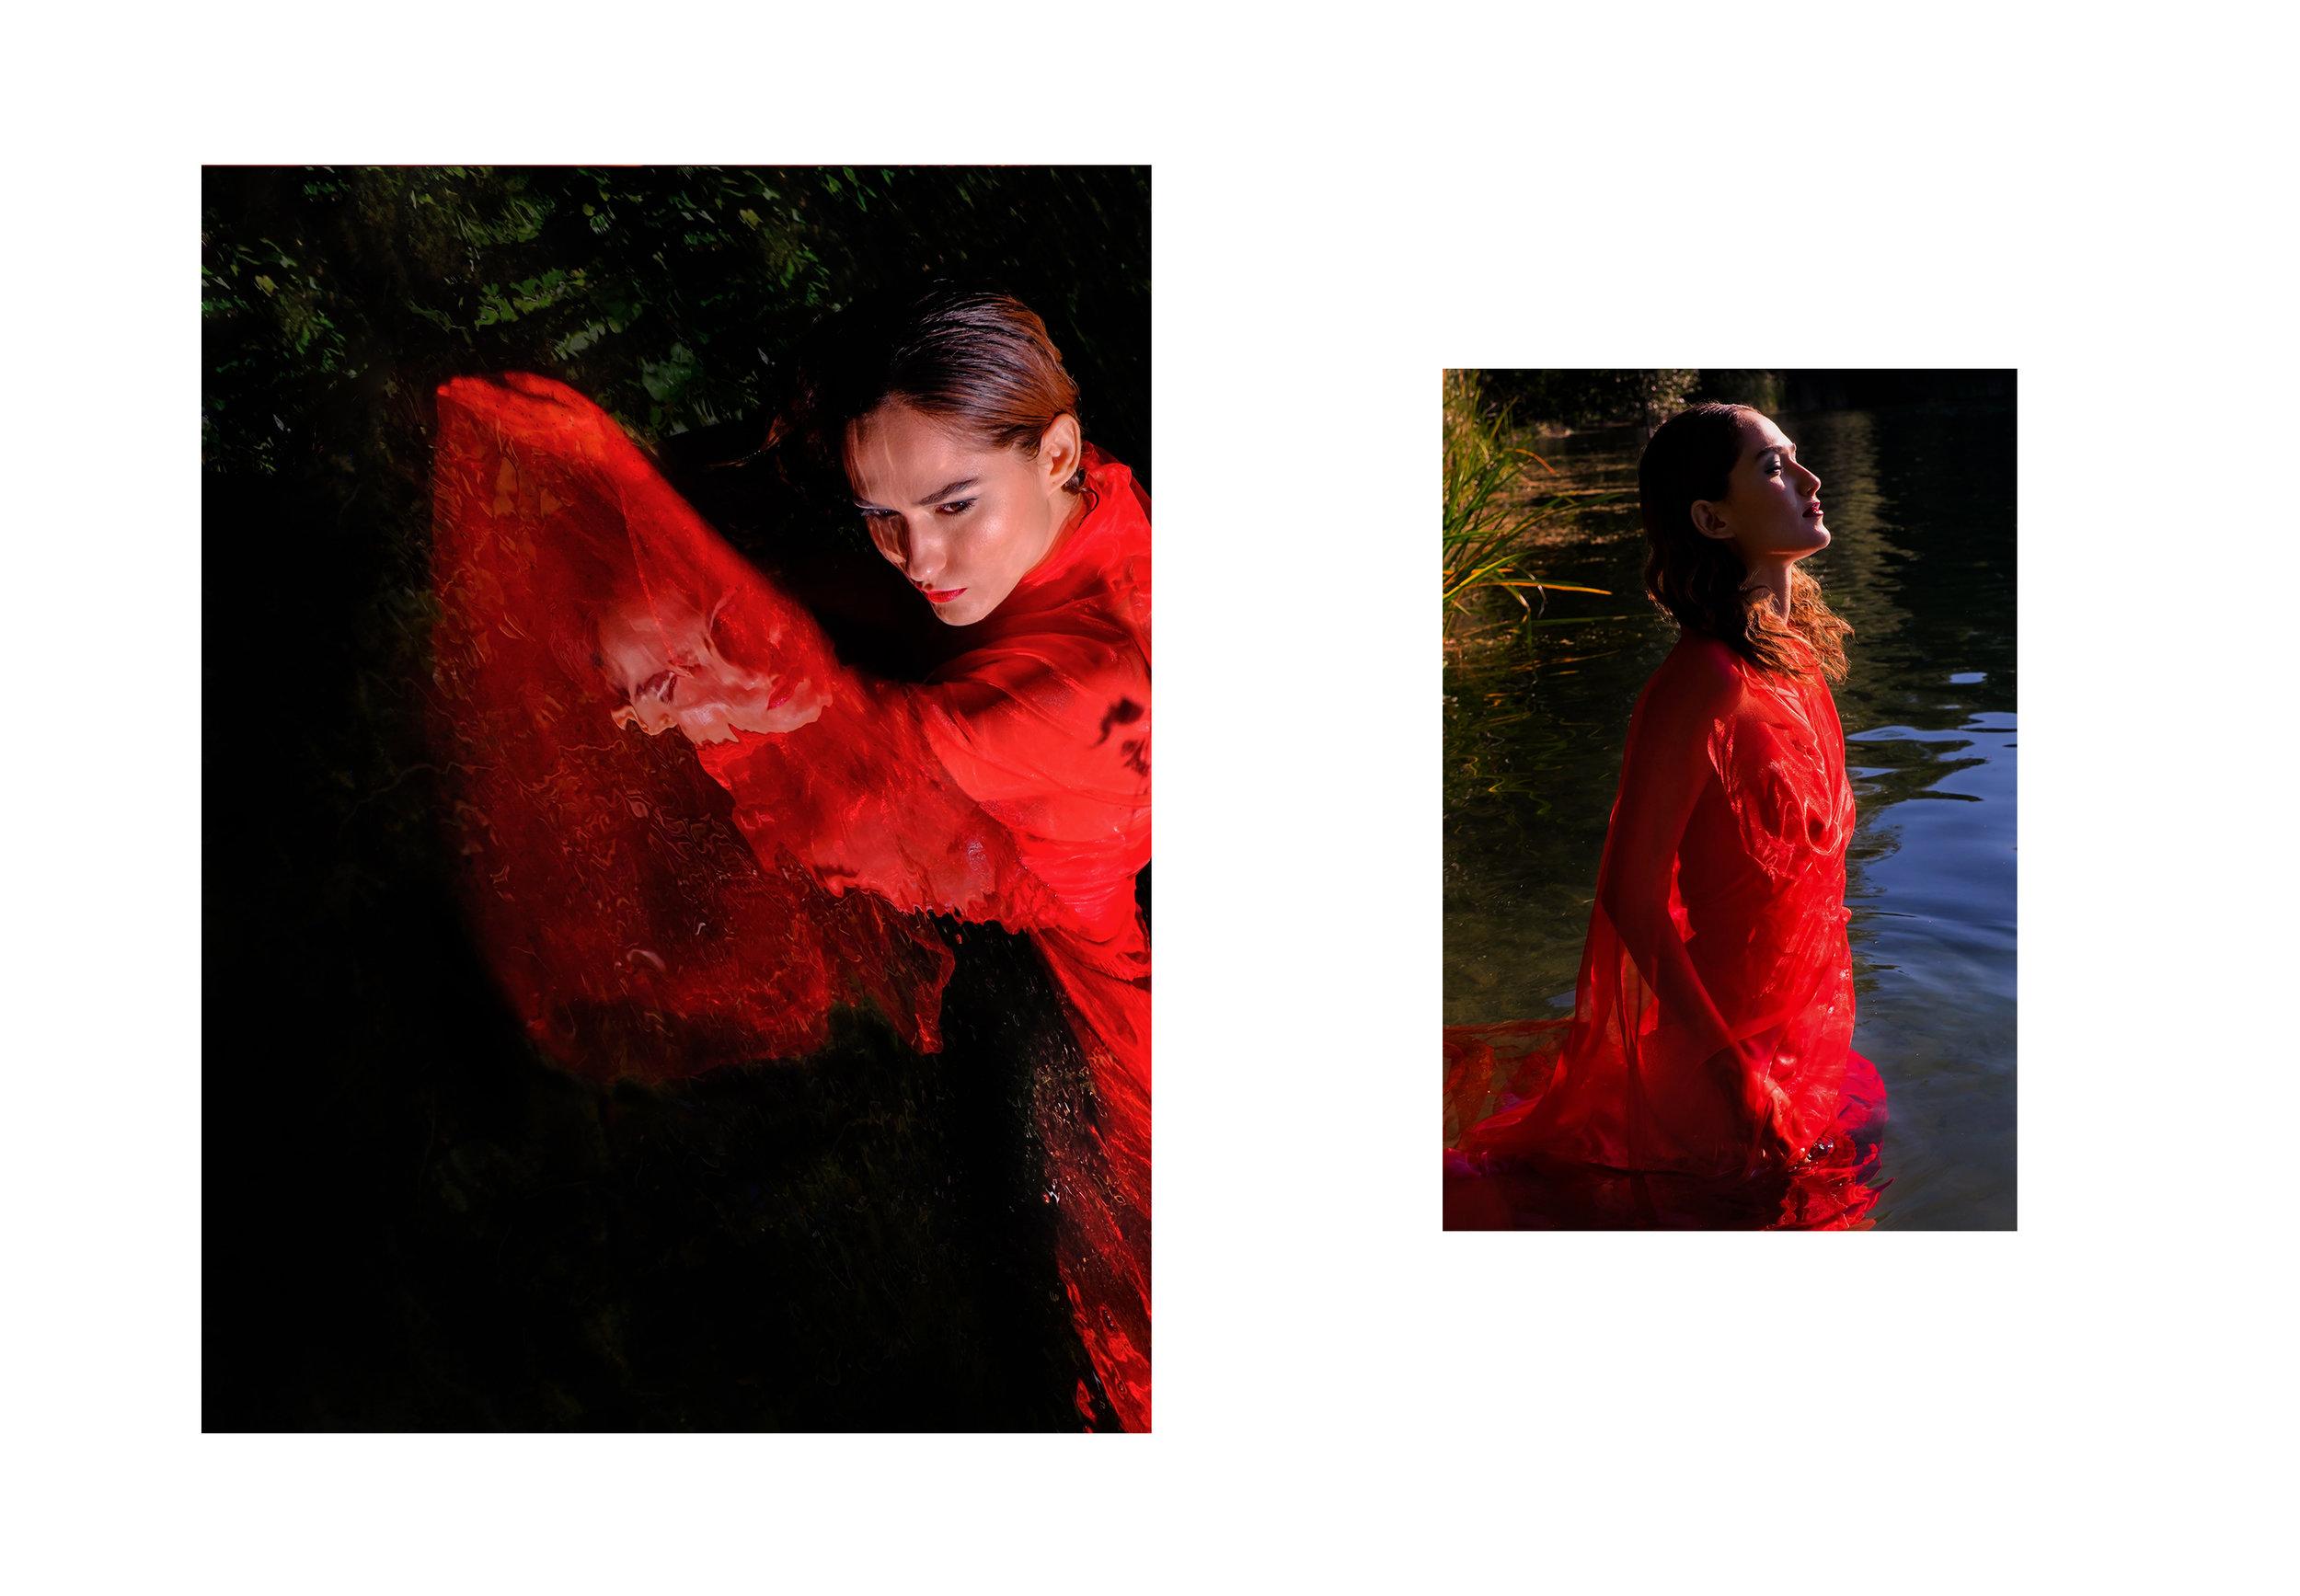 Lorina-H-Beauty-Red-Dress-Movement-Water-matthew-coleman-photography-2.jpg